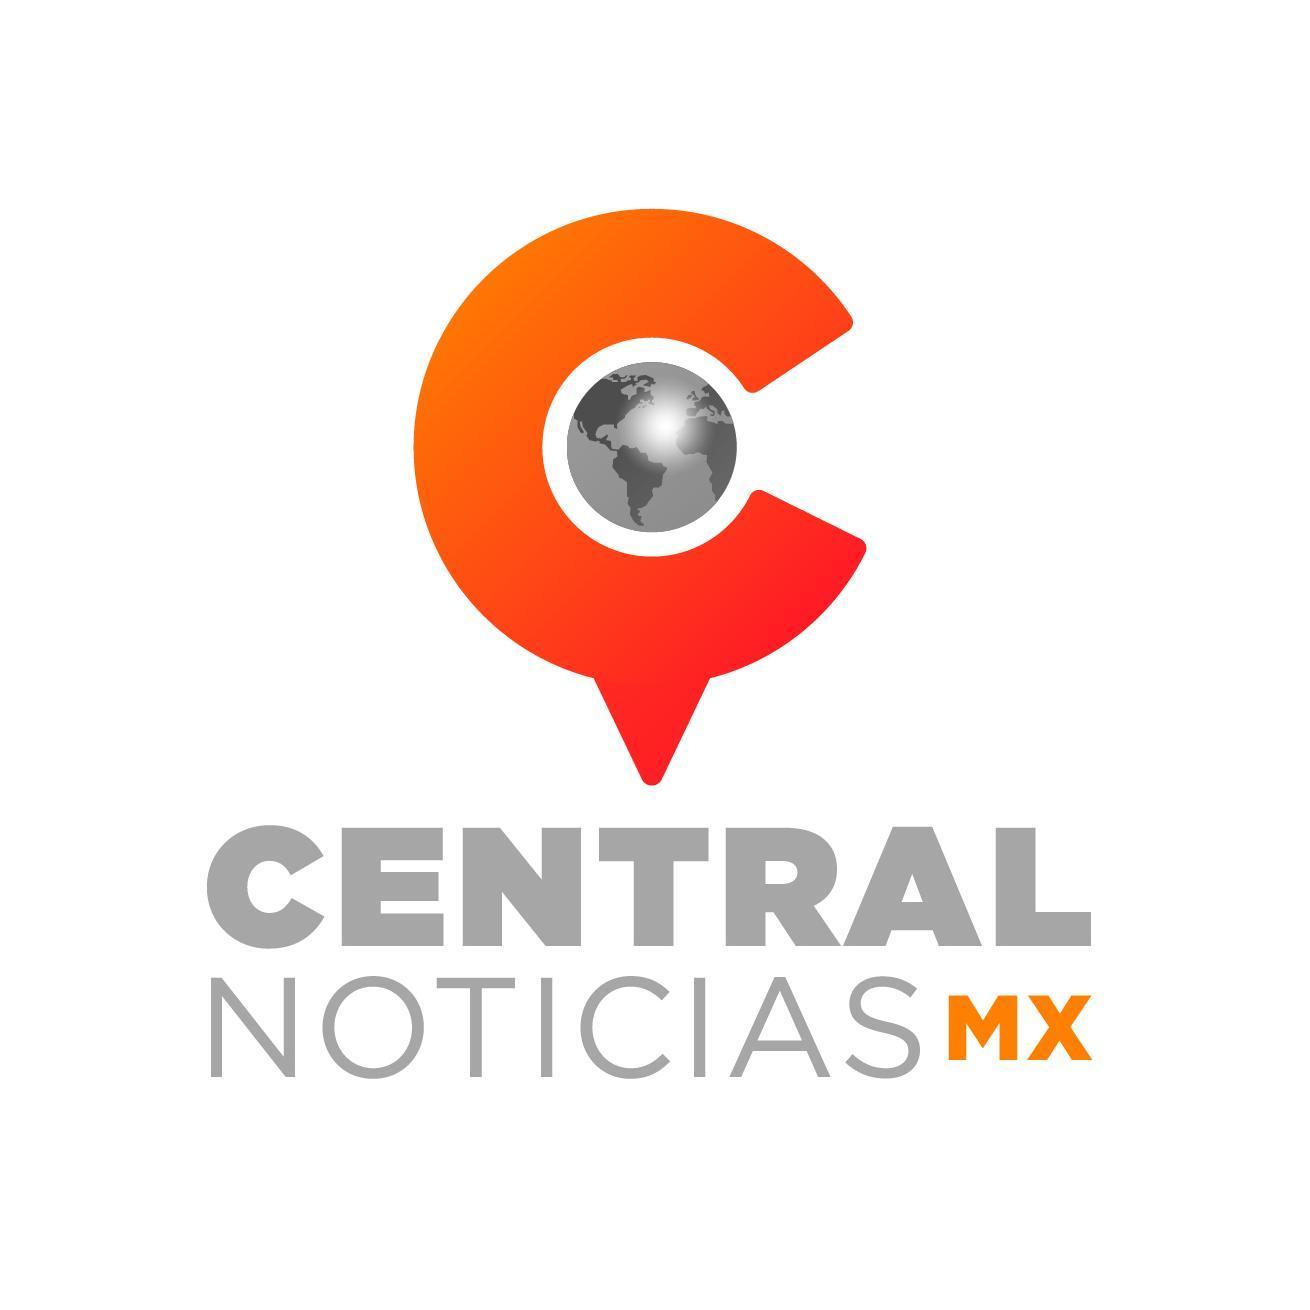 central noticias mx cnmx 2015 twitter